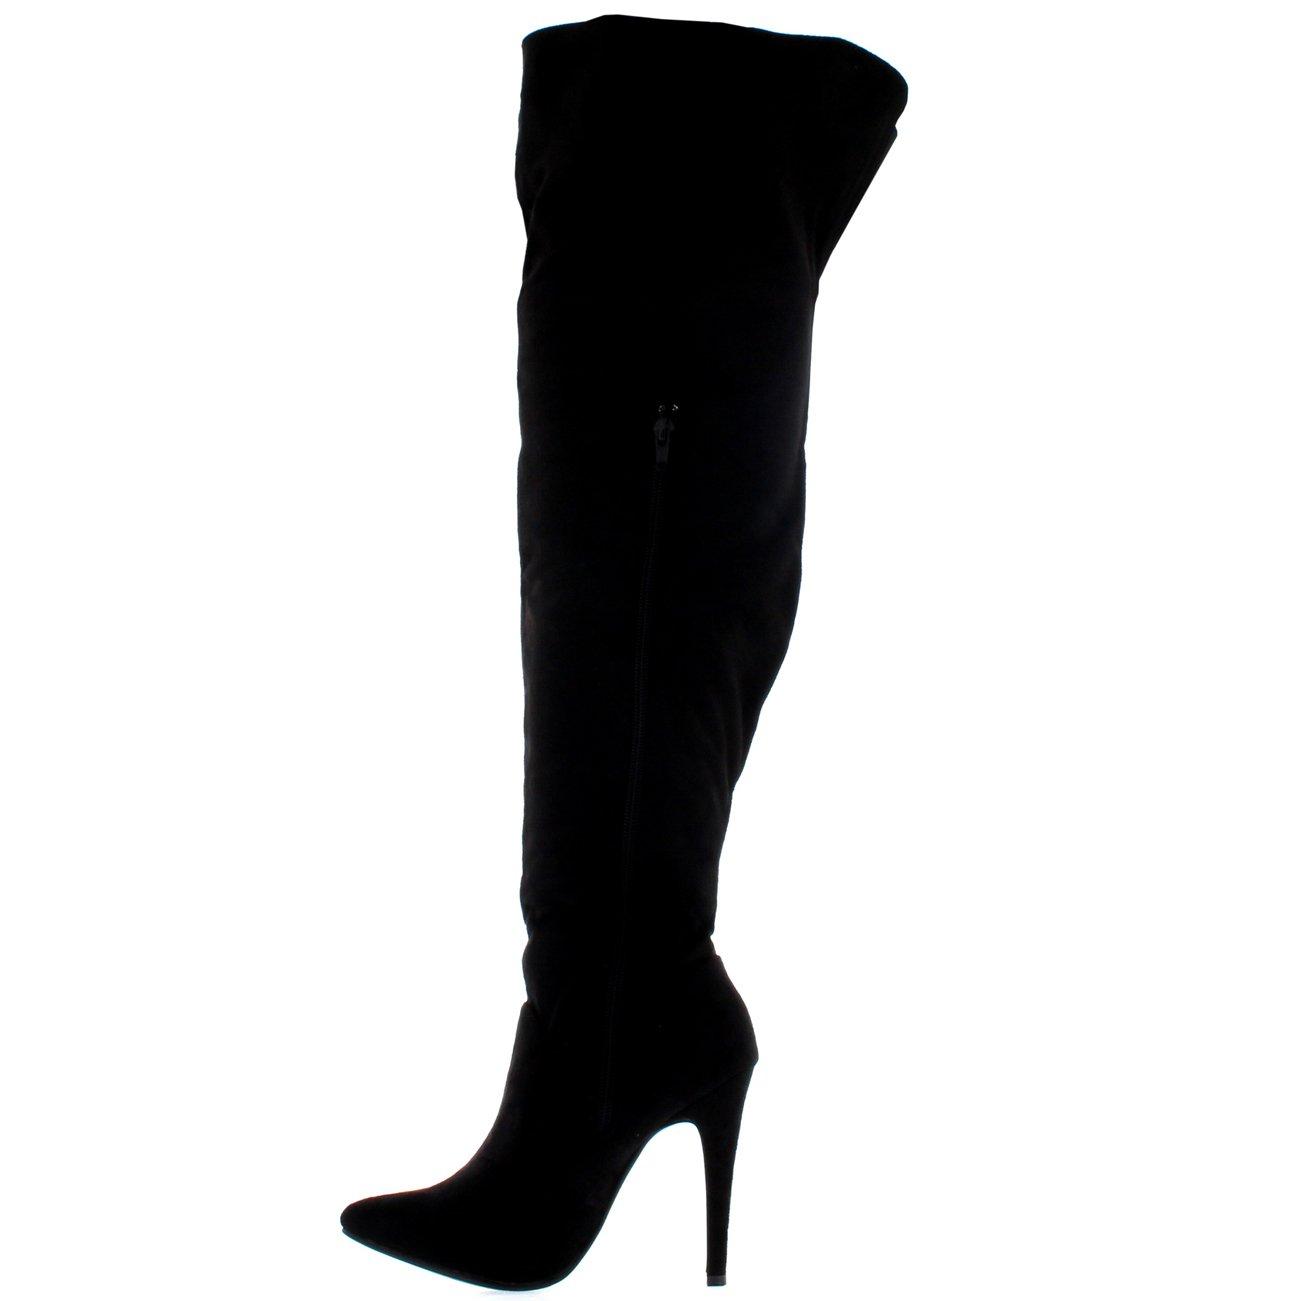 0325516e9c7a Viva Womens Thigh High Platform Stretch High Heels Evening High Heels  Boots  Amazon.co.uk  Shoes   Bags